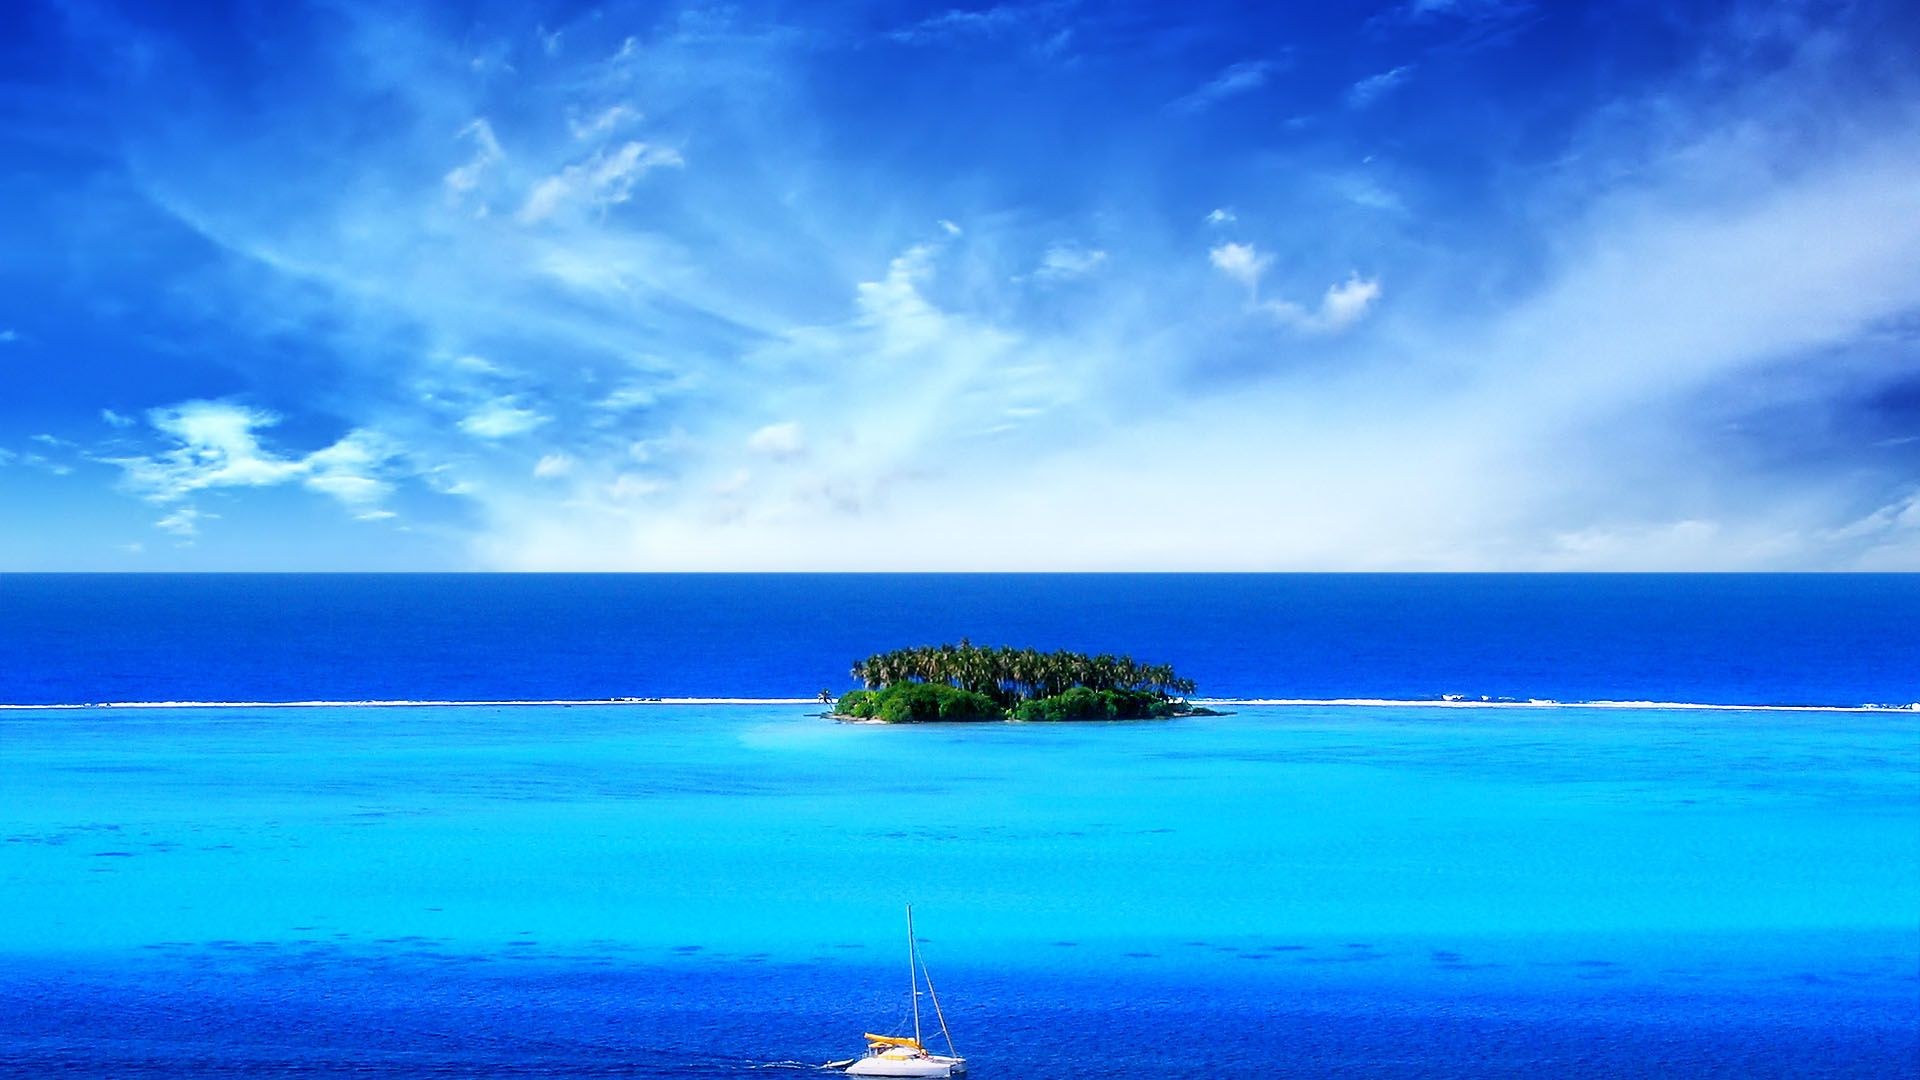 Most Inspiring Wallpaper Macbook Blue - Apple-Macbook-Pro-Wallpapers-015  Gallery_1001725.jpg